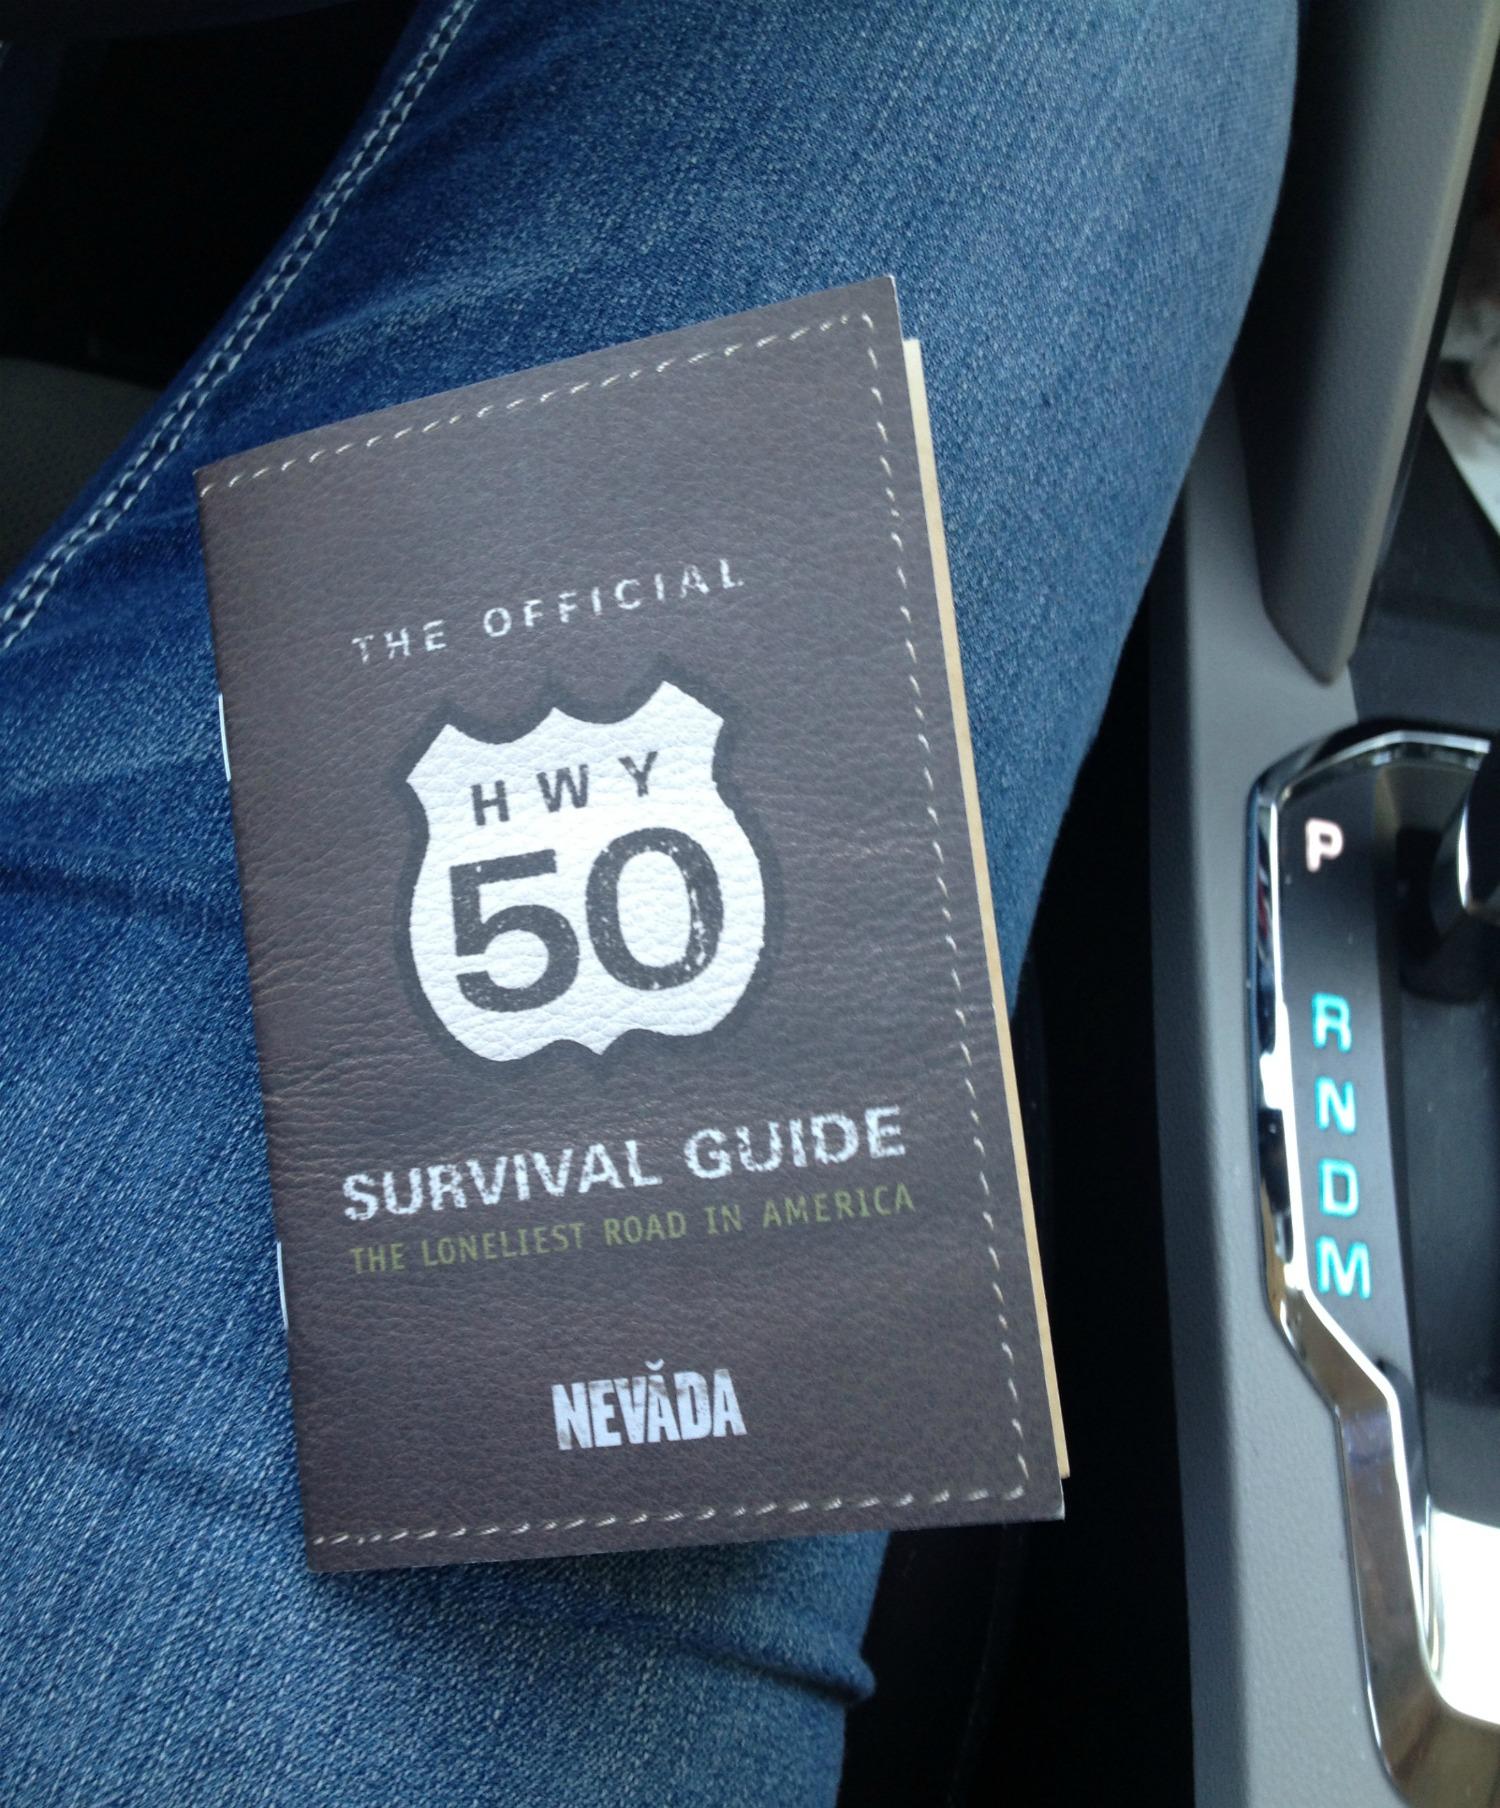 Survival guide pieni.jpg